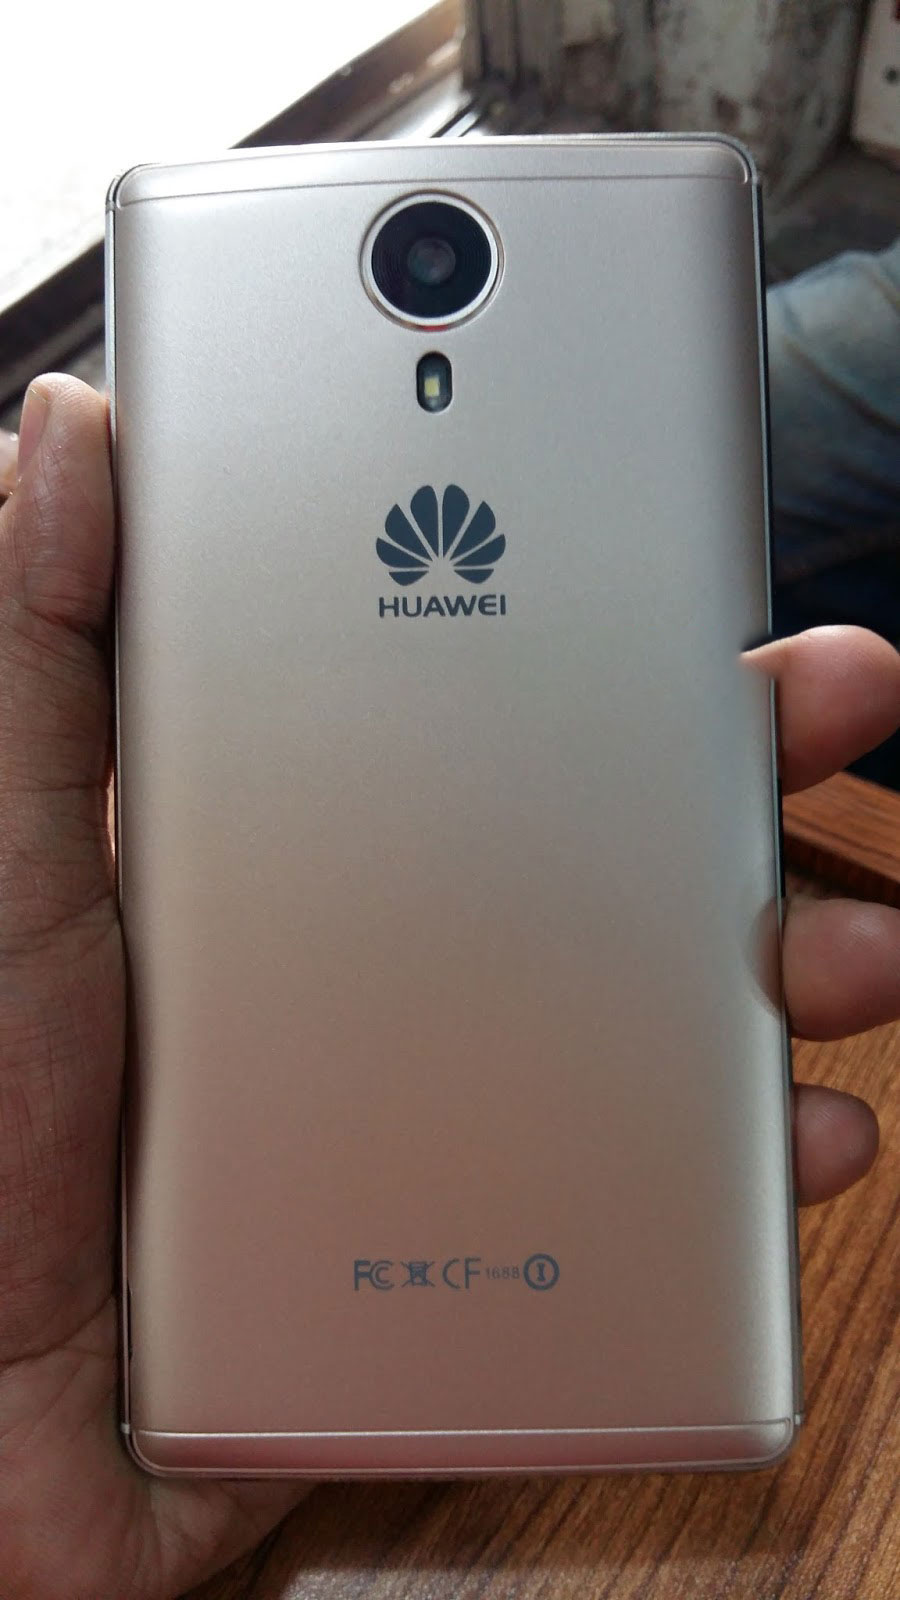 Huawei Cline MT8